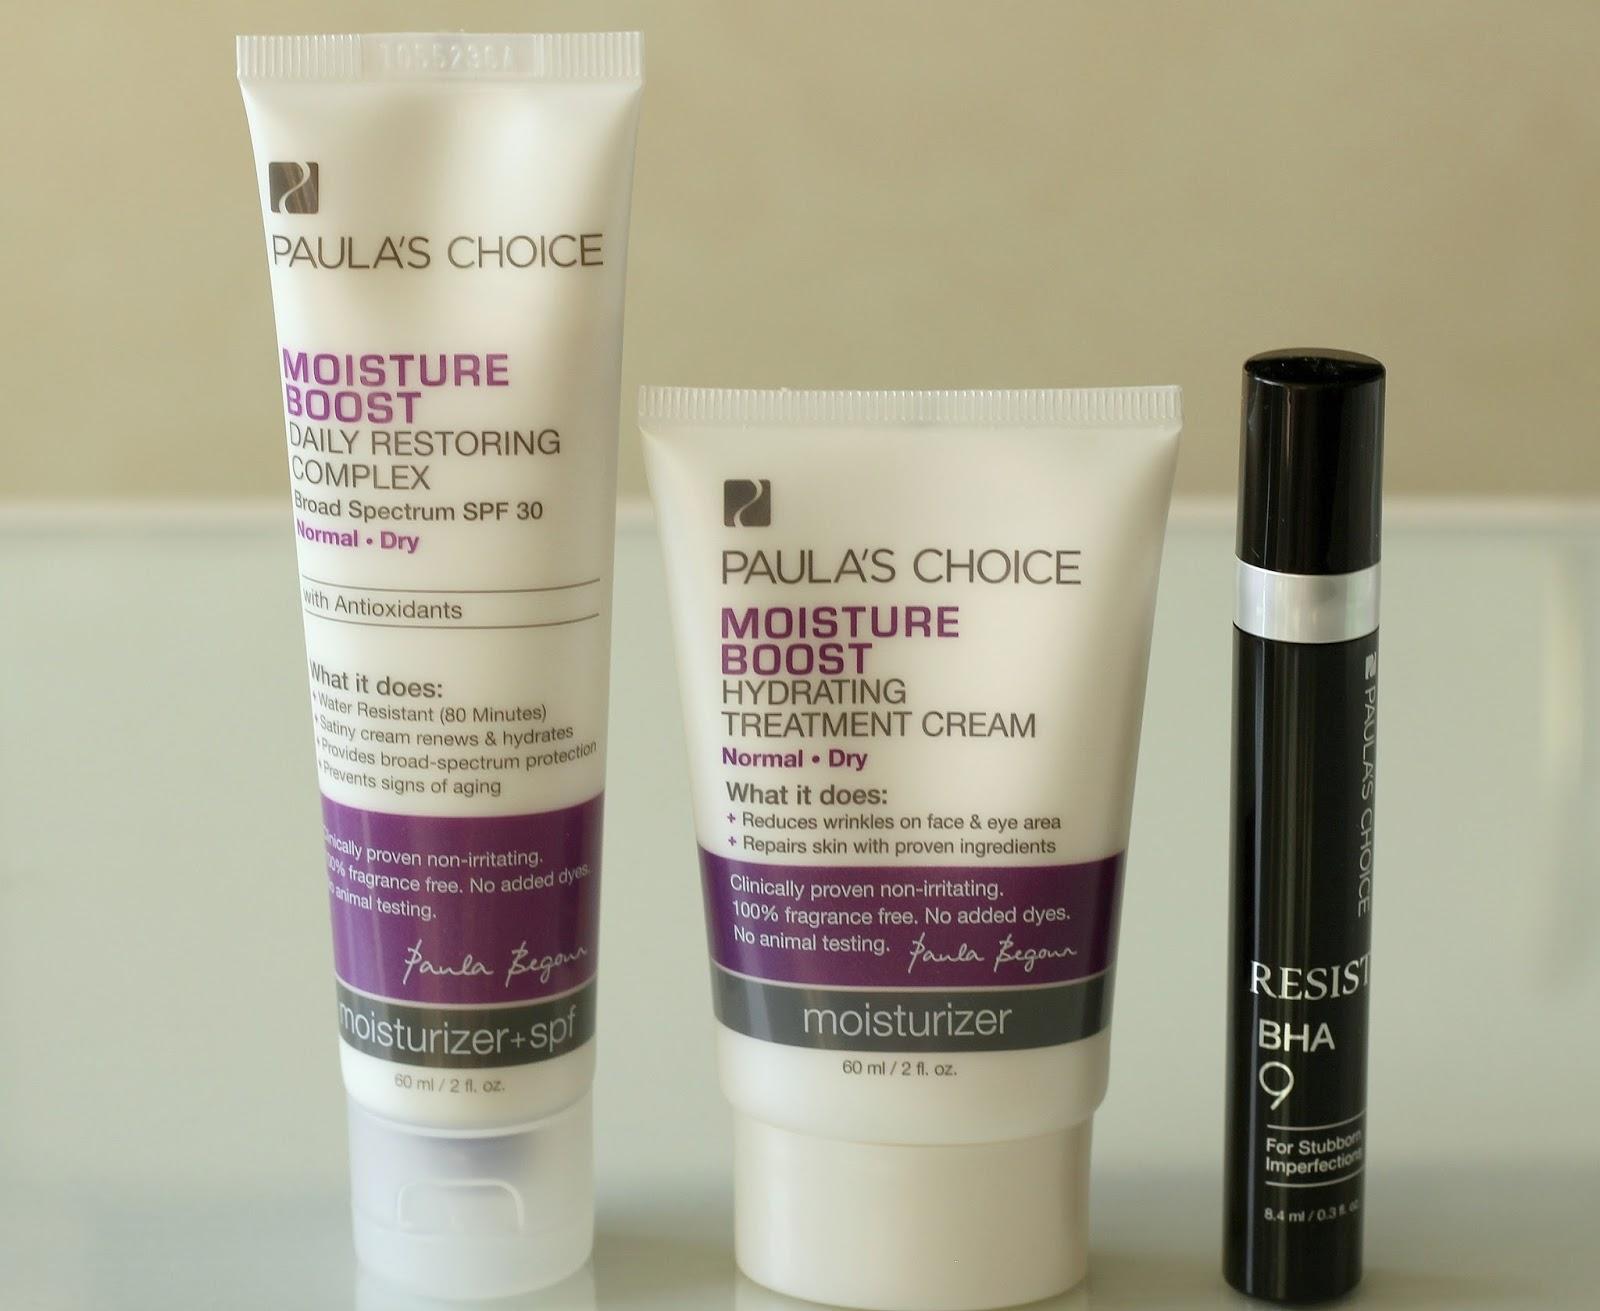 Moisture Boost Daily Restoring Complex SPF 30 Resist BHA 9 Treatment Moisture Boost Hydrating Treatment Cream